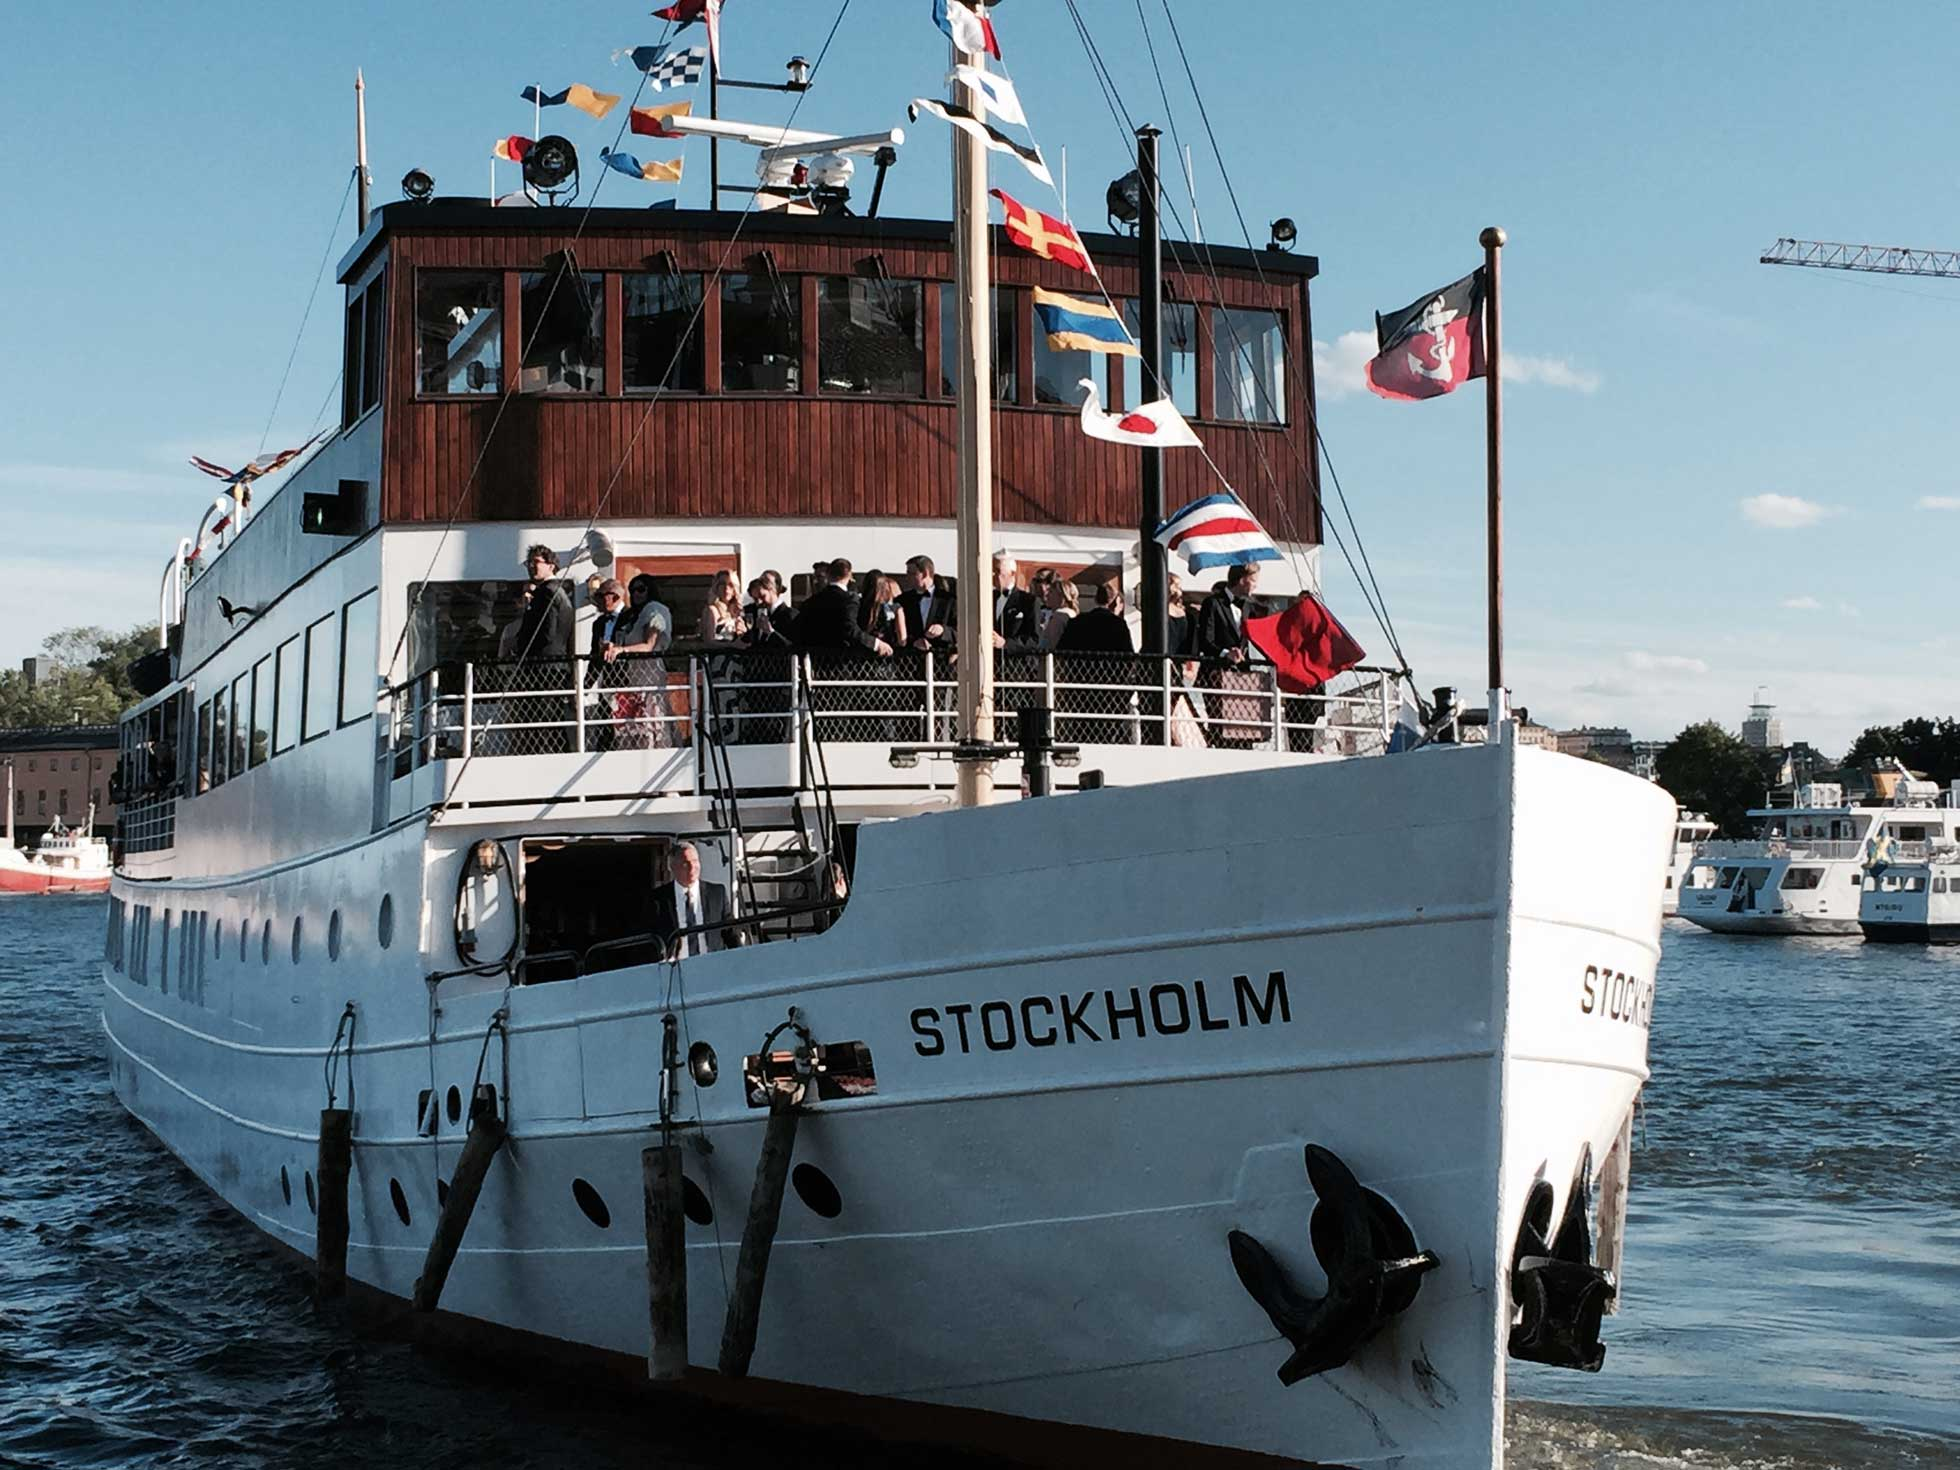 Festbåt Stockholm